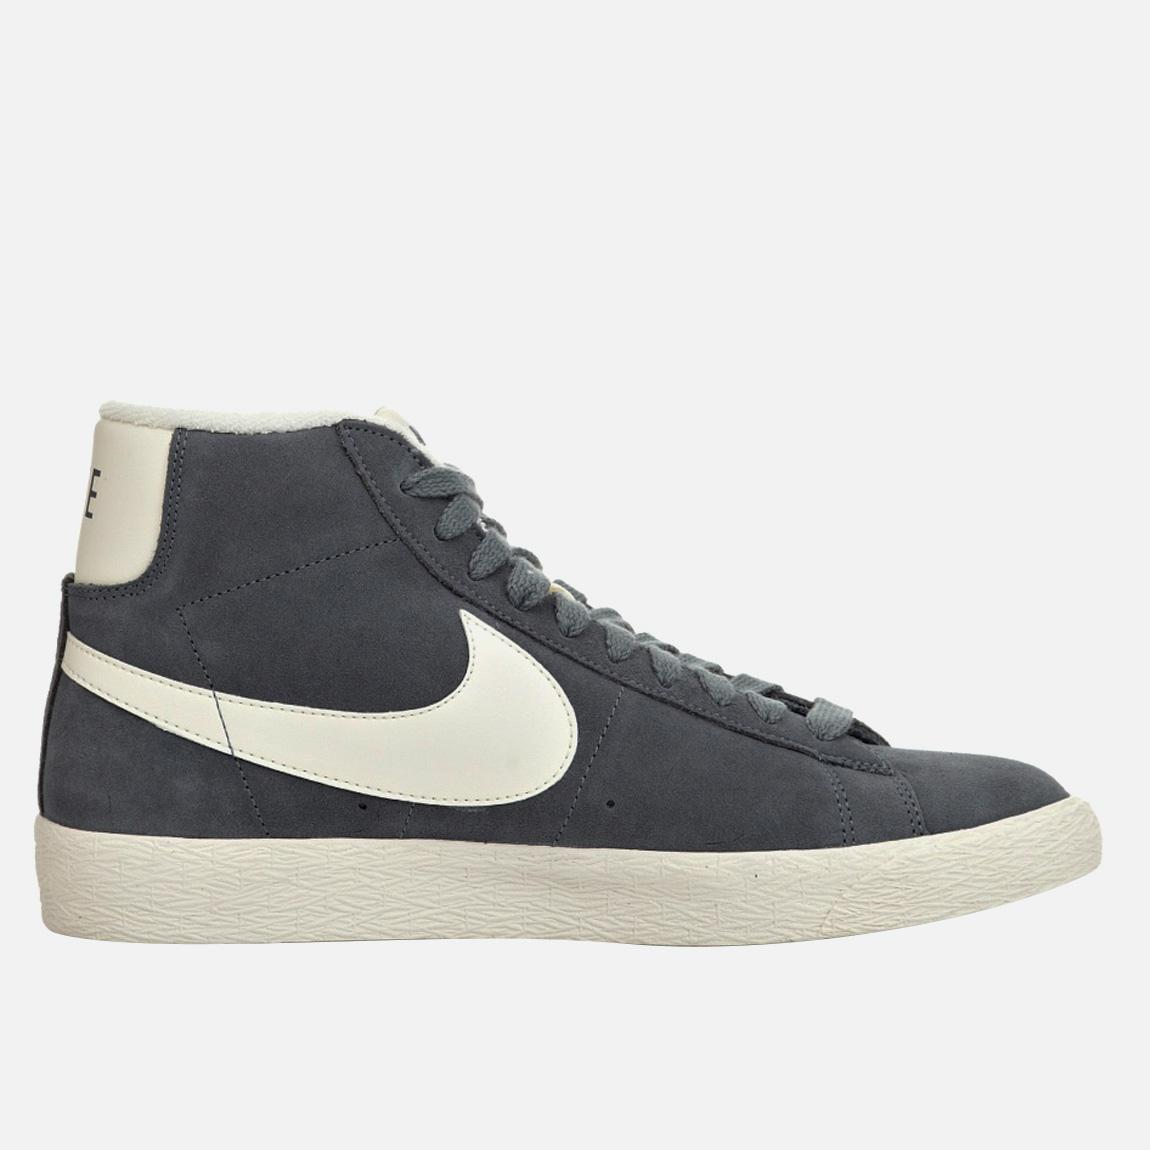 competitive price 5603a 4c7d7 Blazer Mid Suede Vintage – Grey Nike Sneakers  Superbalist.c